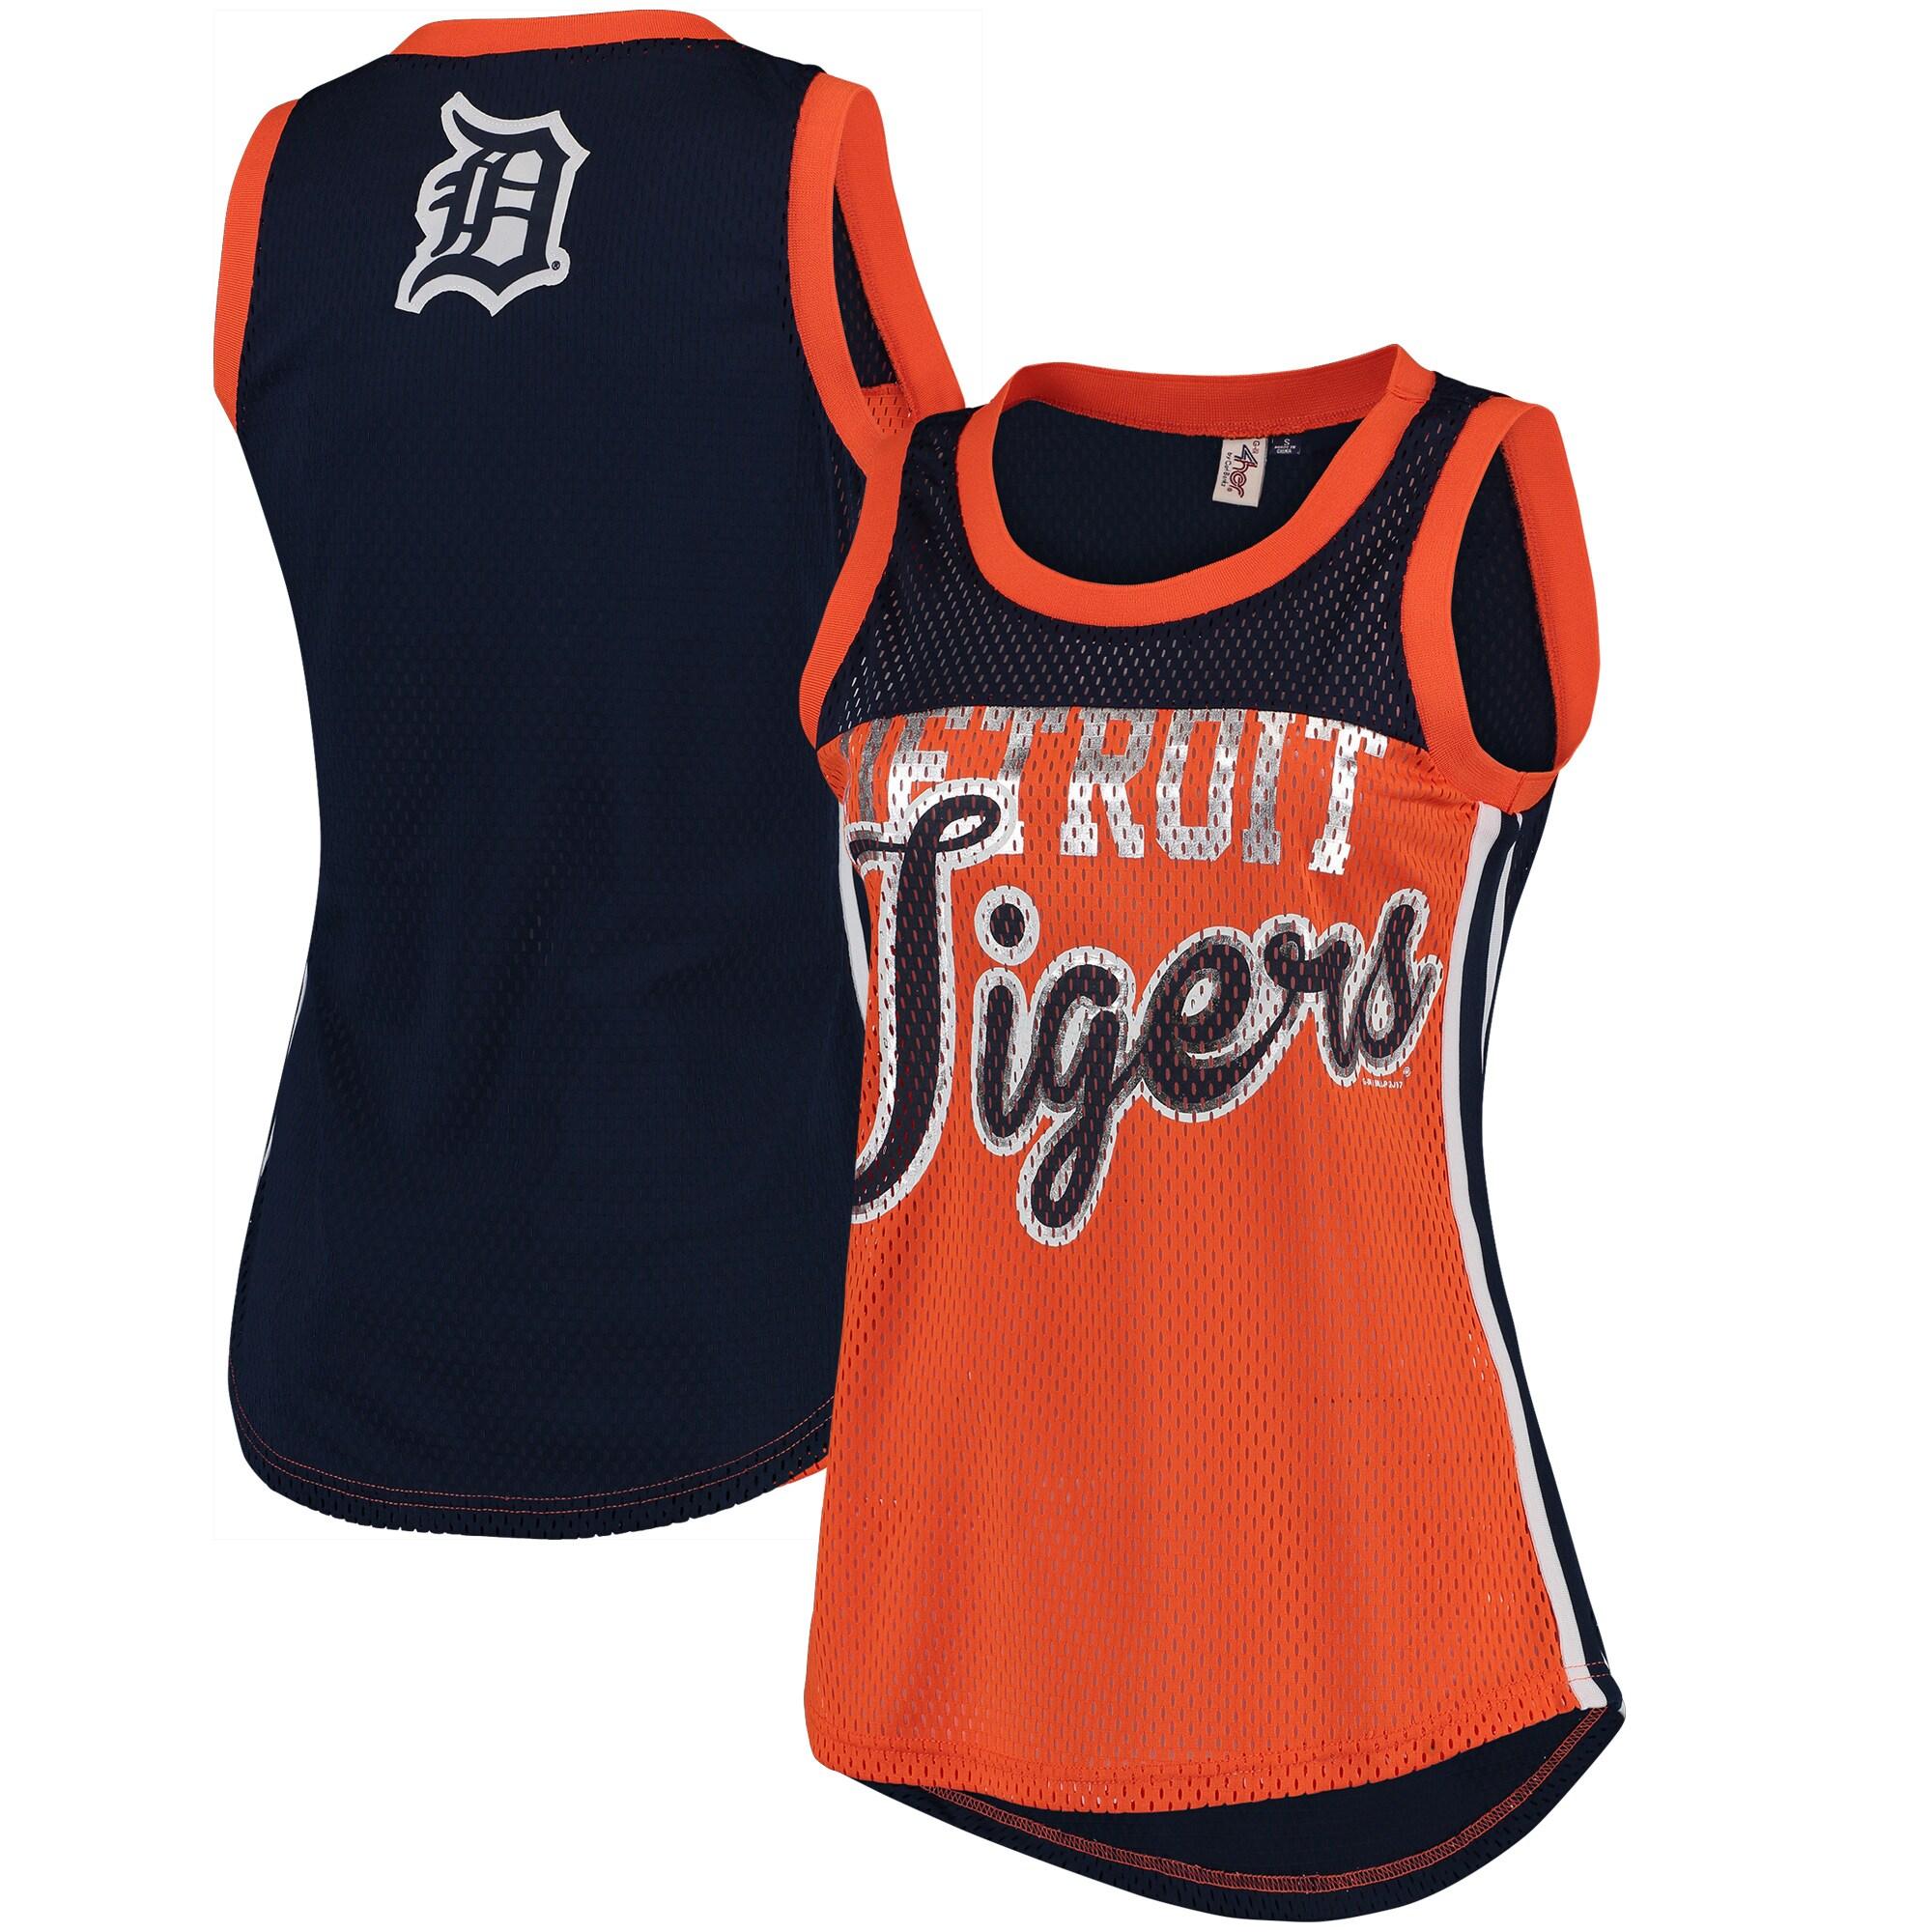 Detroit Tigers G-III 4Her by Carl Banks Women's Championship Tank Top - Orange/Navy